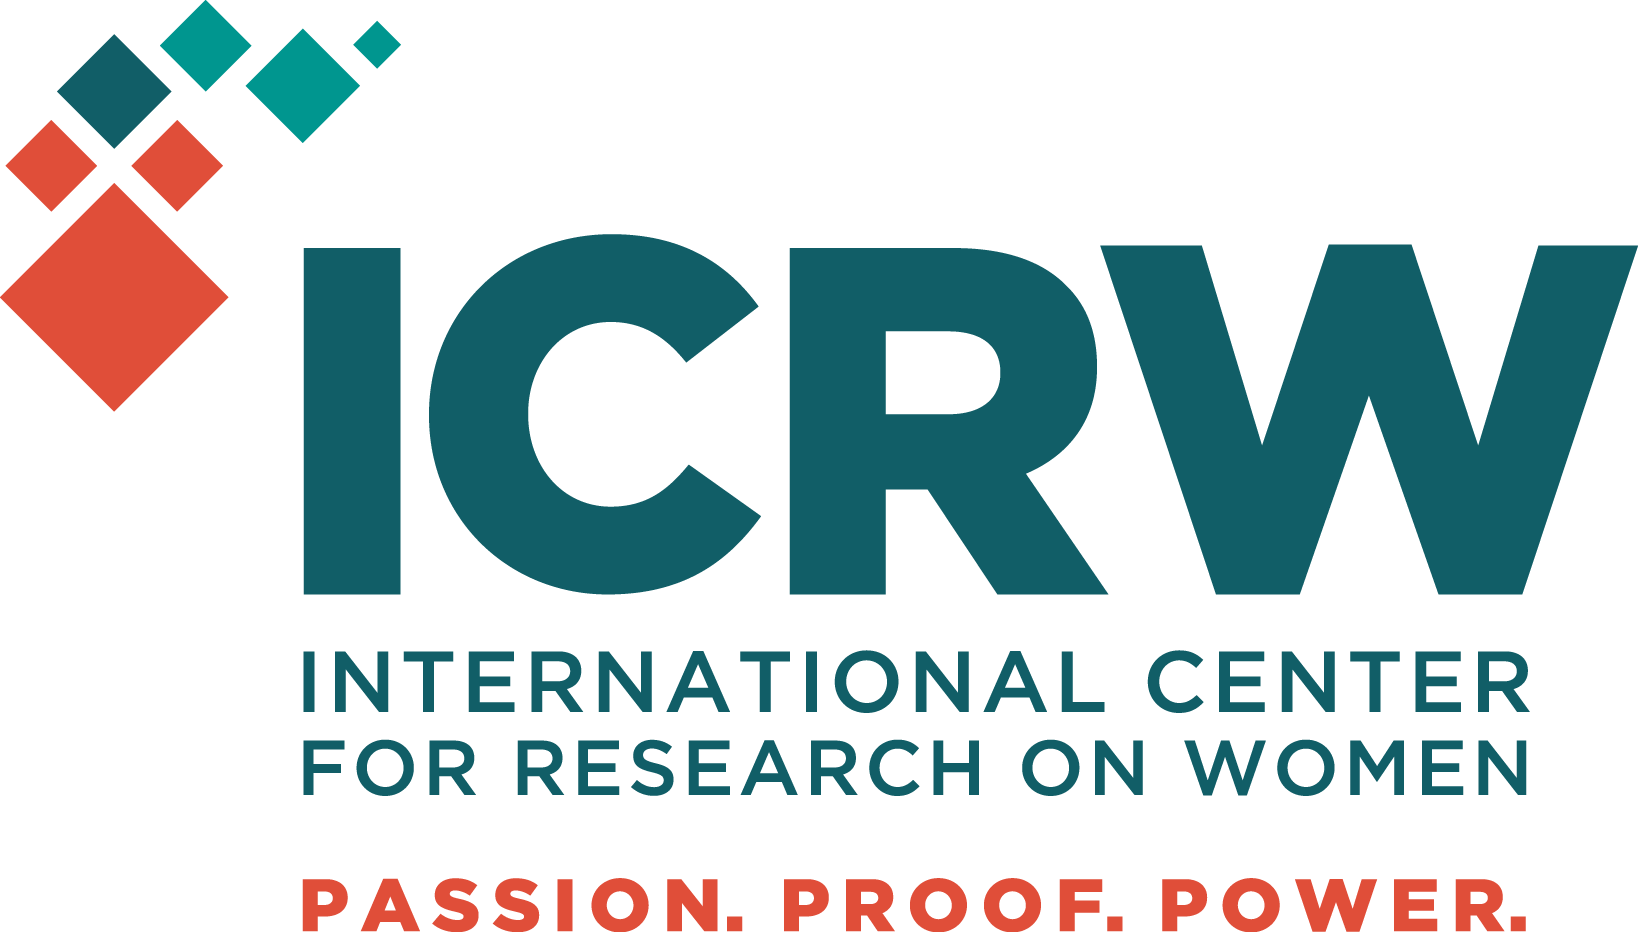 Deepa Jha - ICRW_Logo_RGB.png